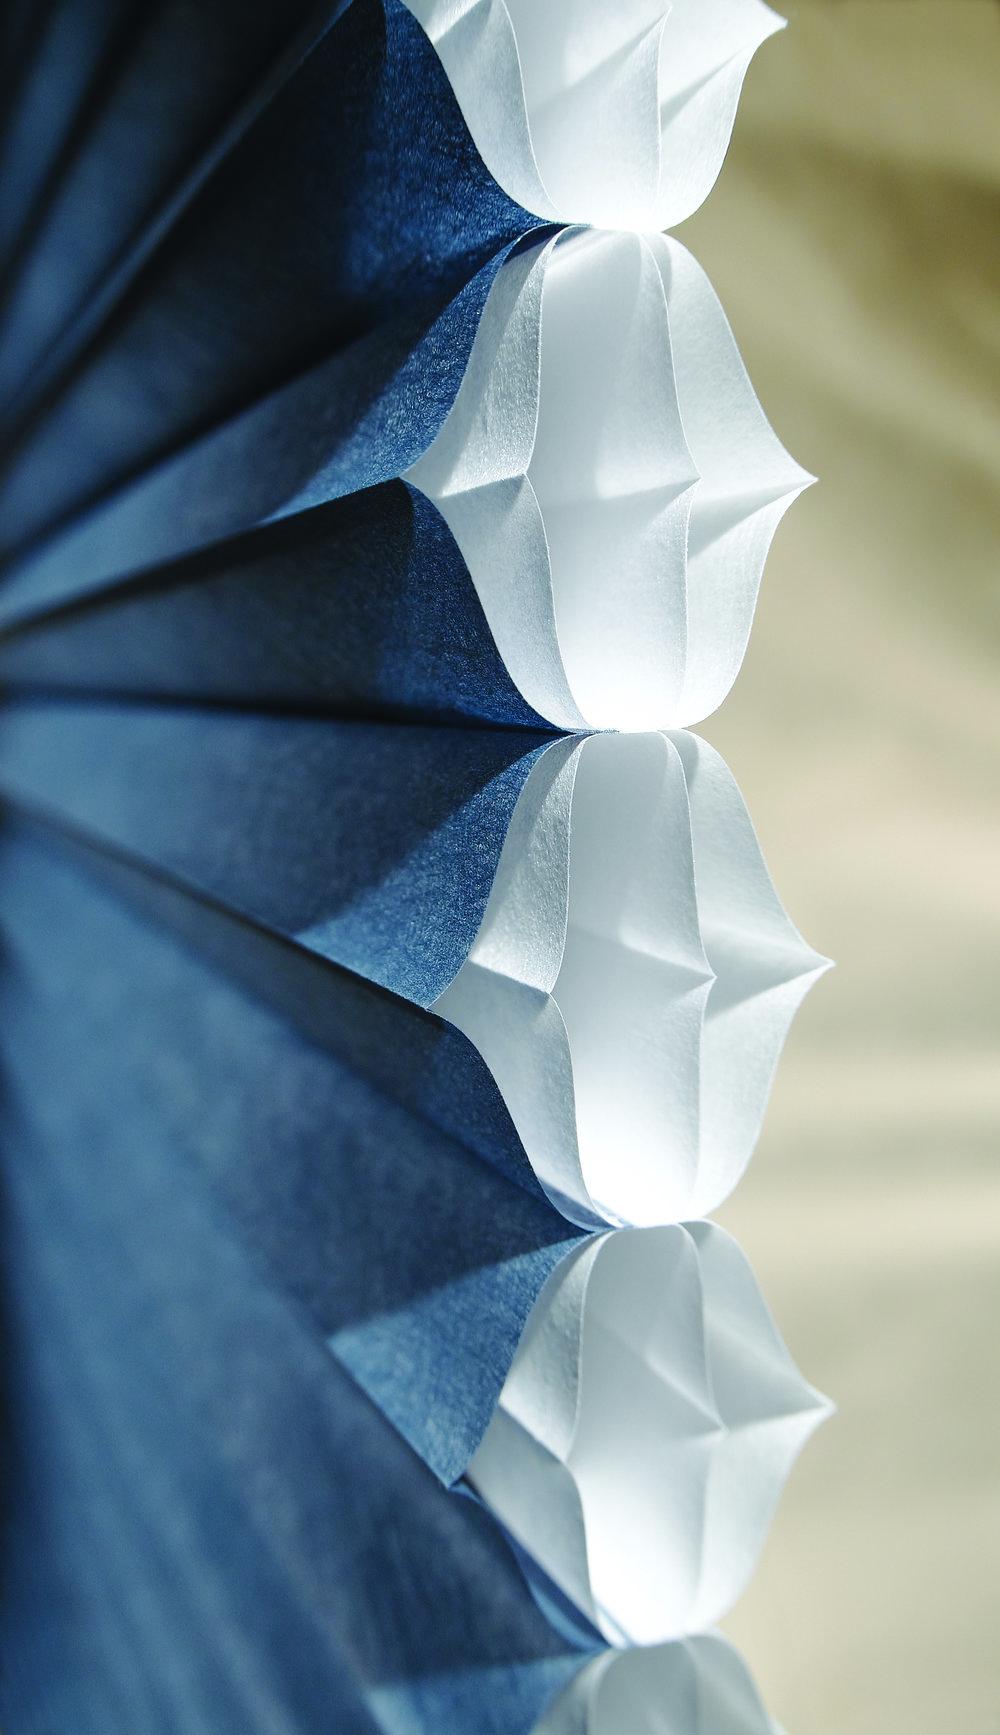 2006_DU_Panache_Fabric Detail_Blue.jpeg